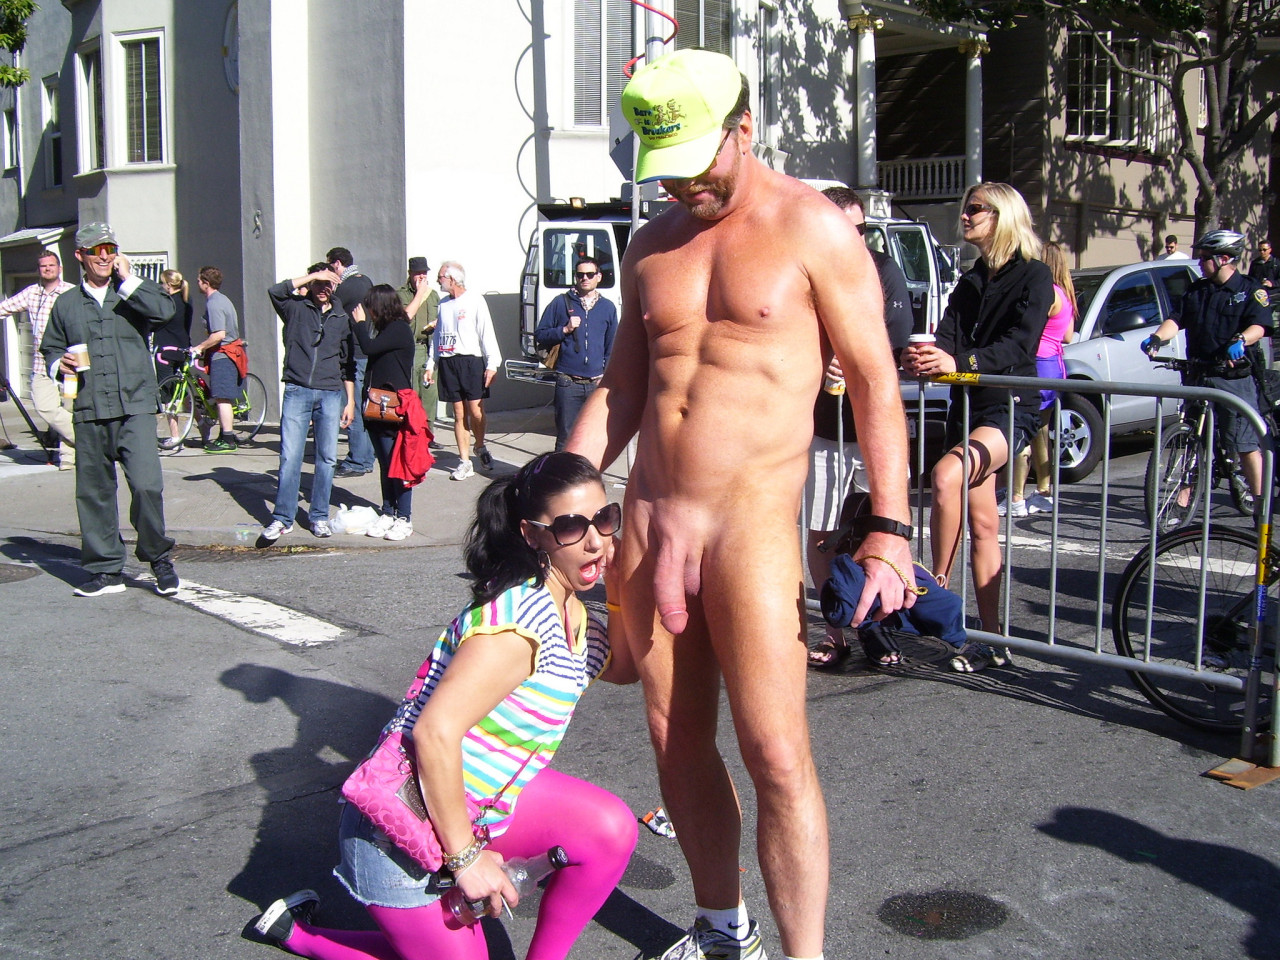 cfnm girls touching erection